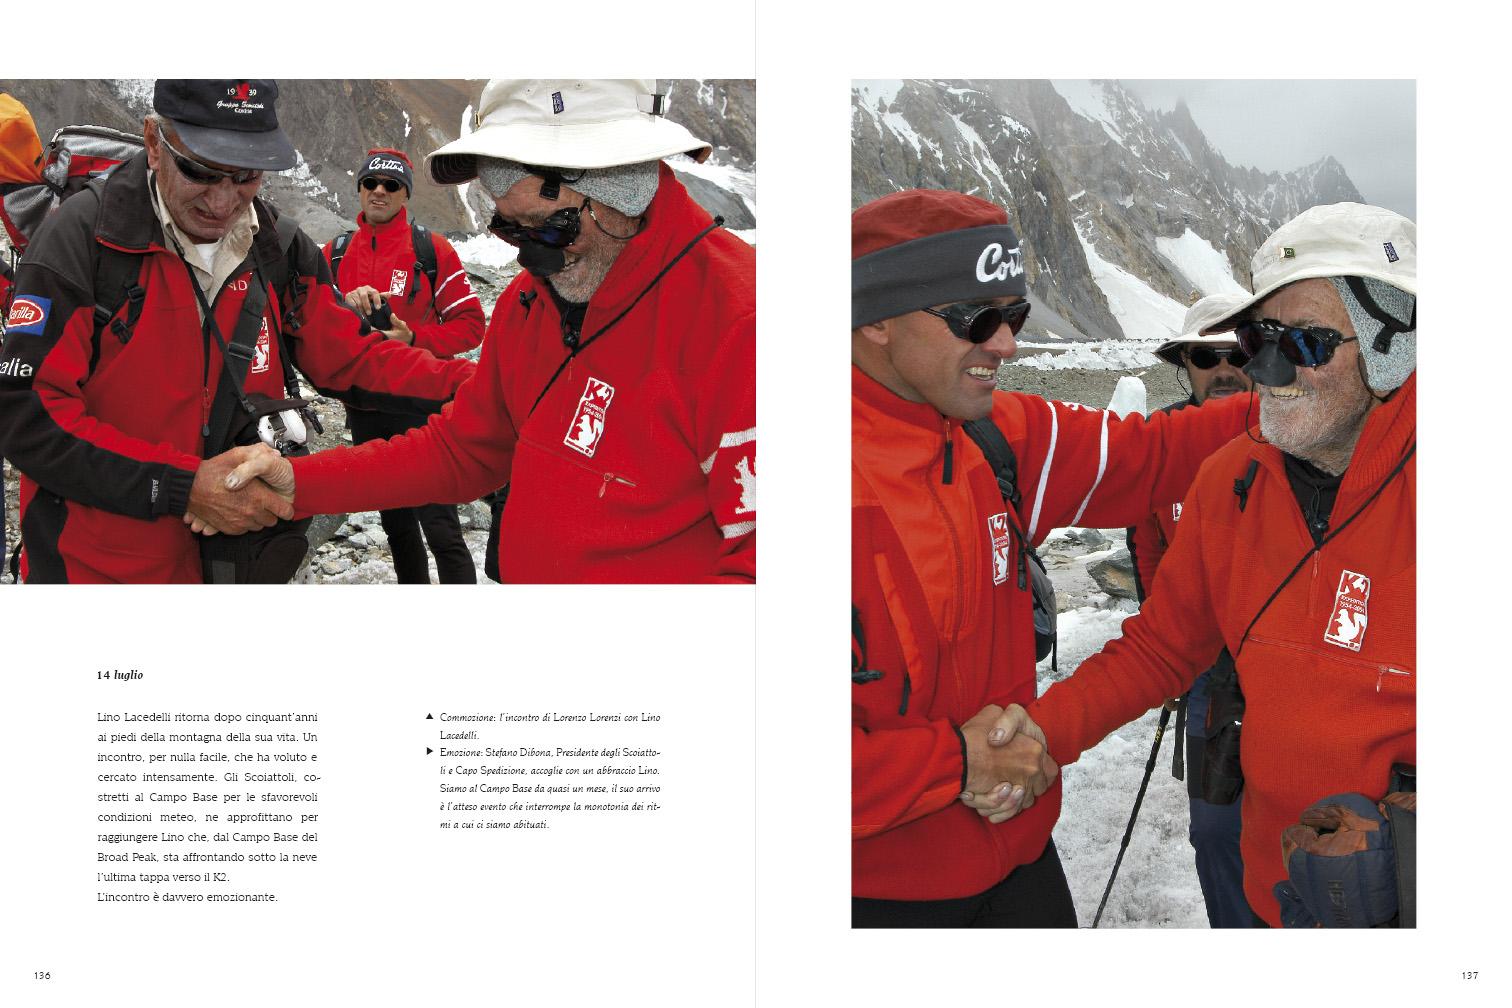 K2 EXPEDITION 1954-2004 Giuseppe Ghedina Fotografo - 070.jpg